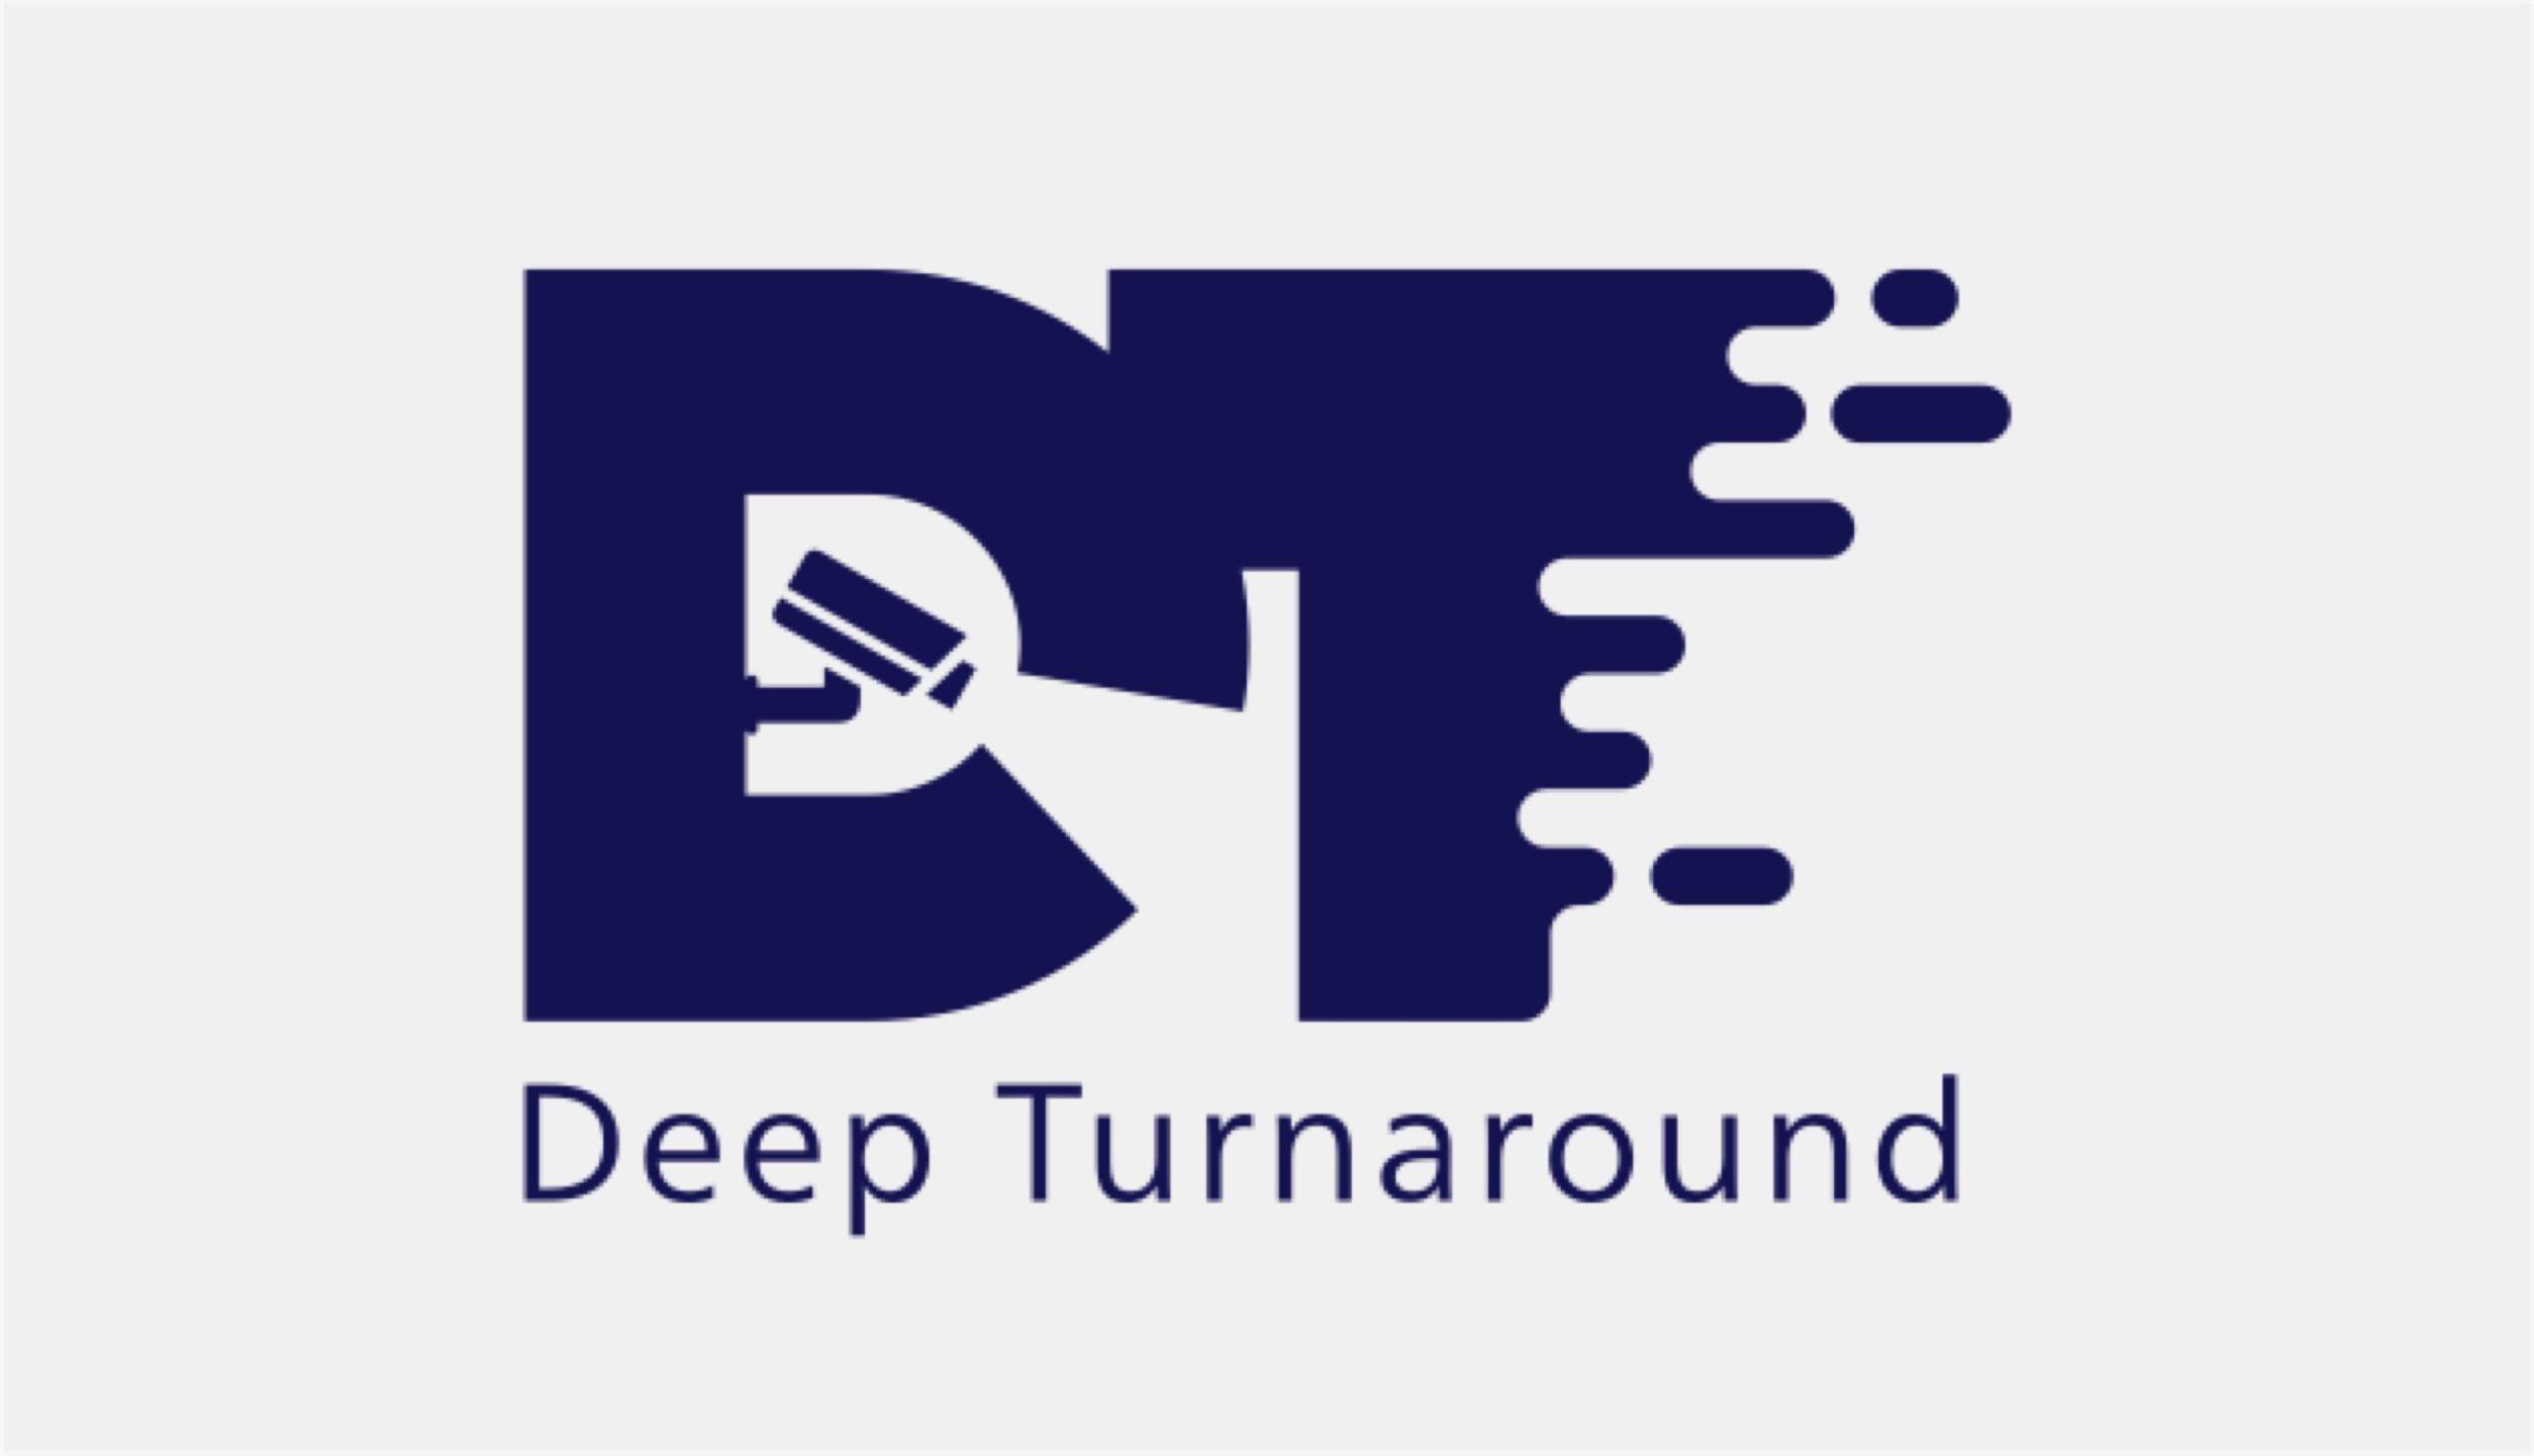 DT_02-1